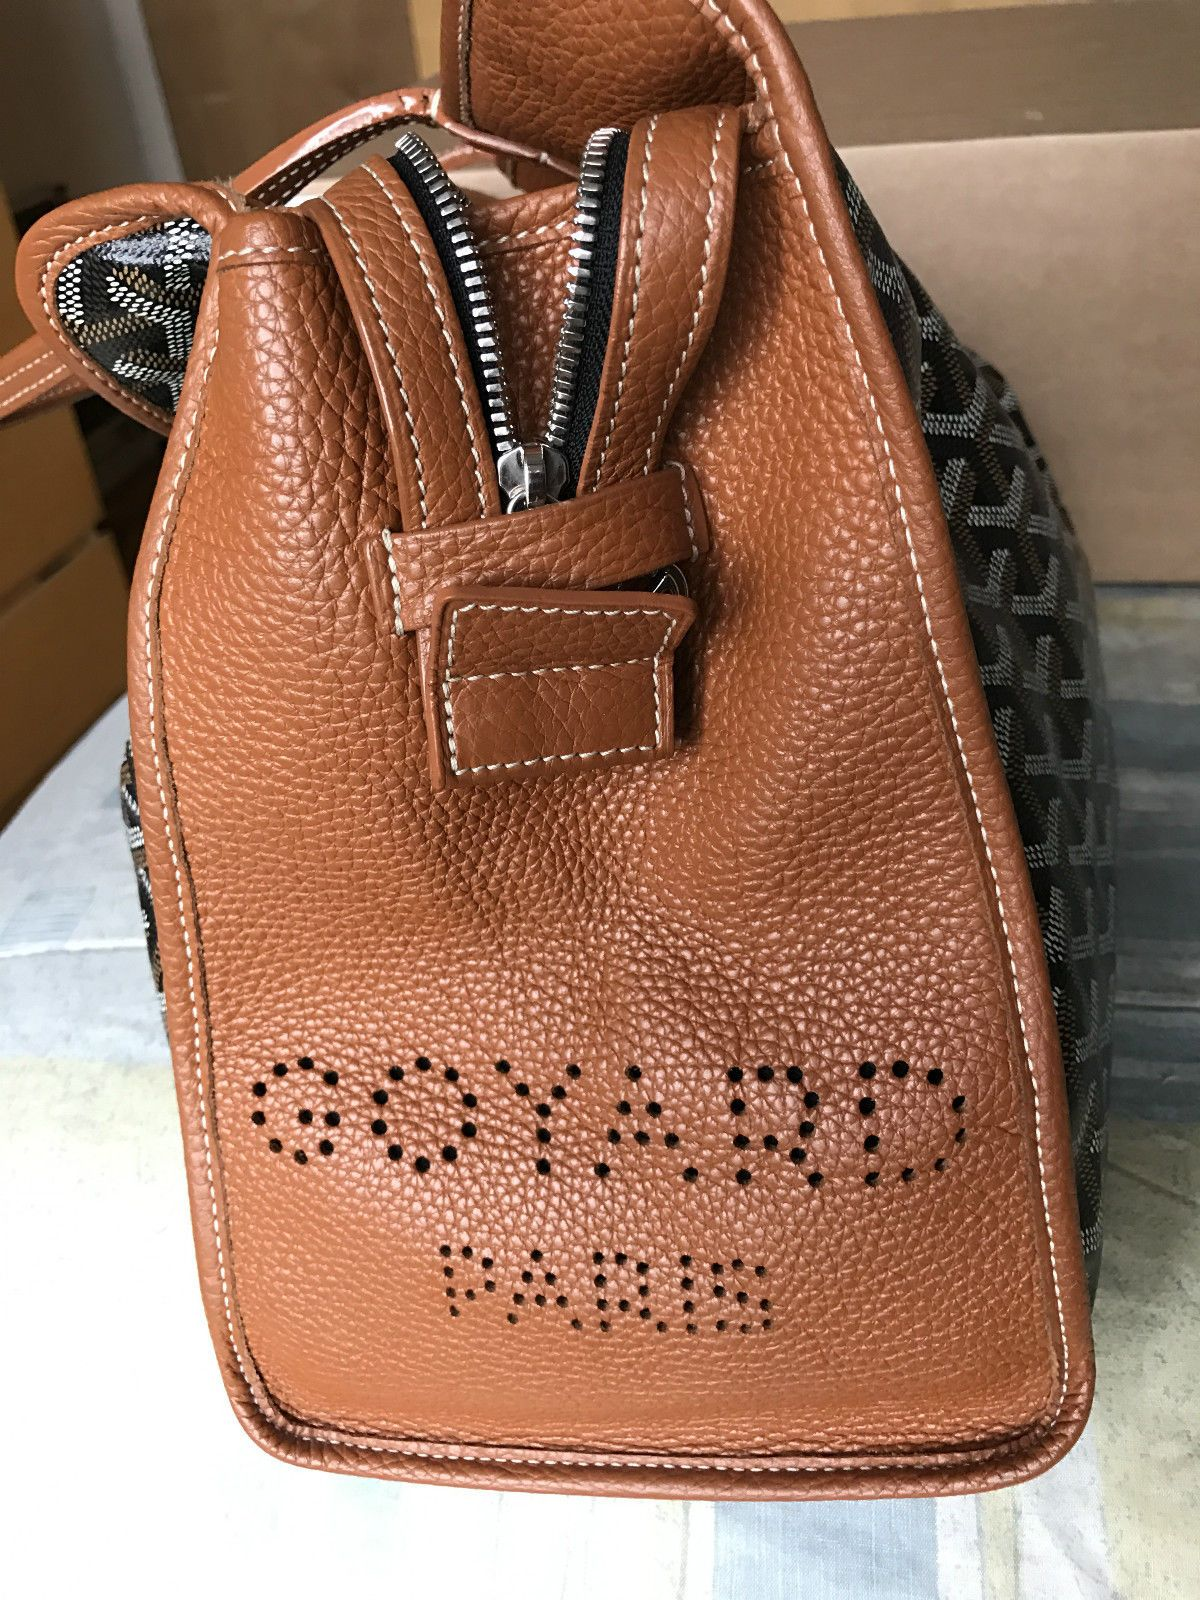 e6b2bce4 Goyard The Sac Hardy PM Black/Tan Weekender Travel Tote Dog Carrier Handbag